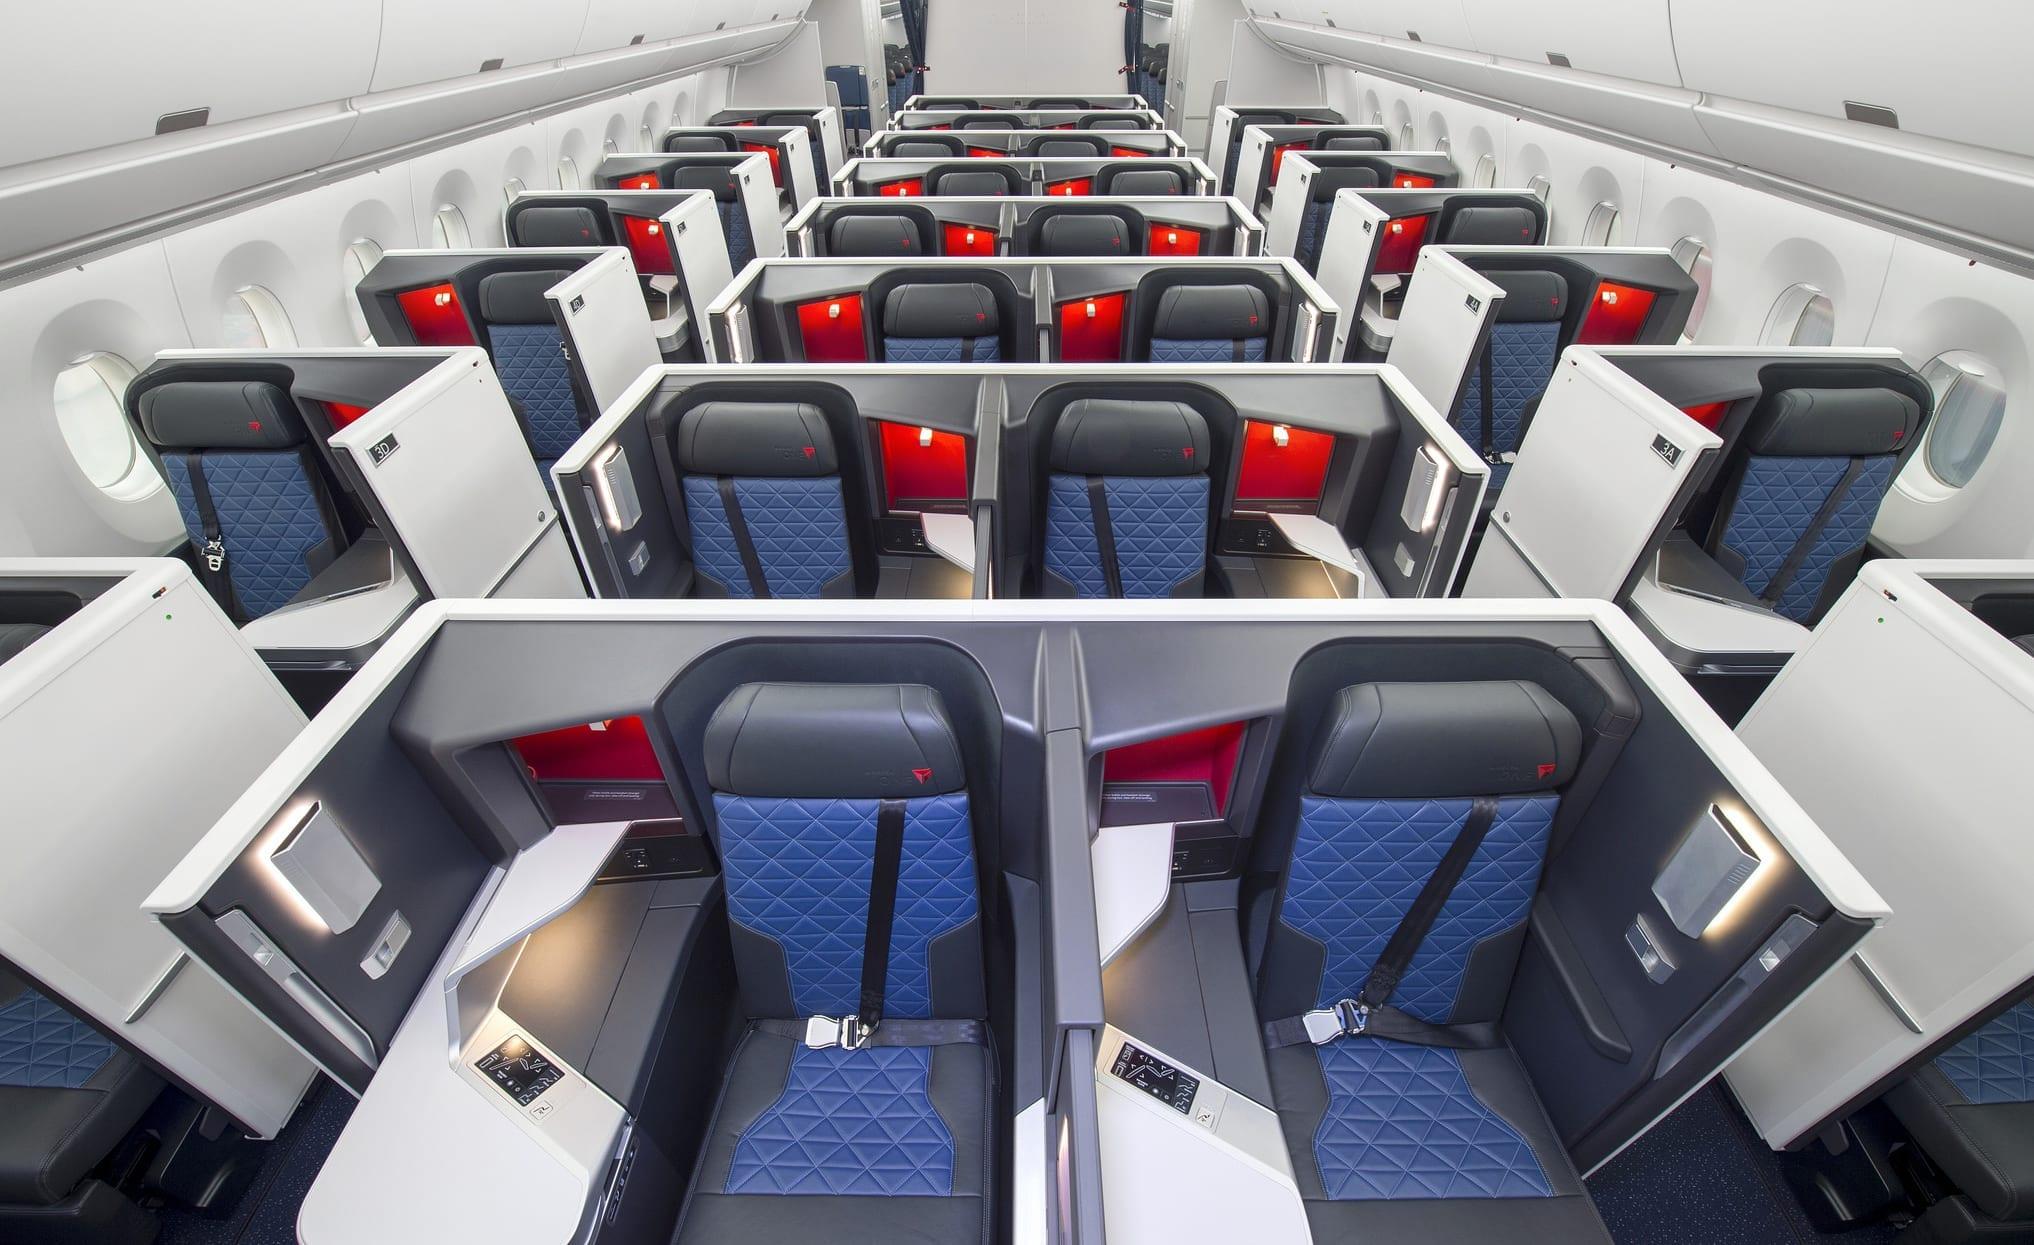 Delta Makes Flight Upgrades With Skymiles Idiot Proof...